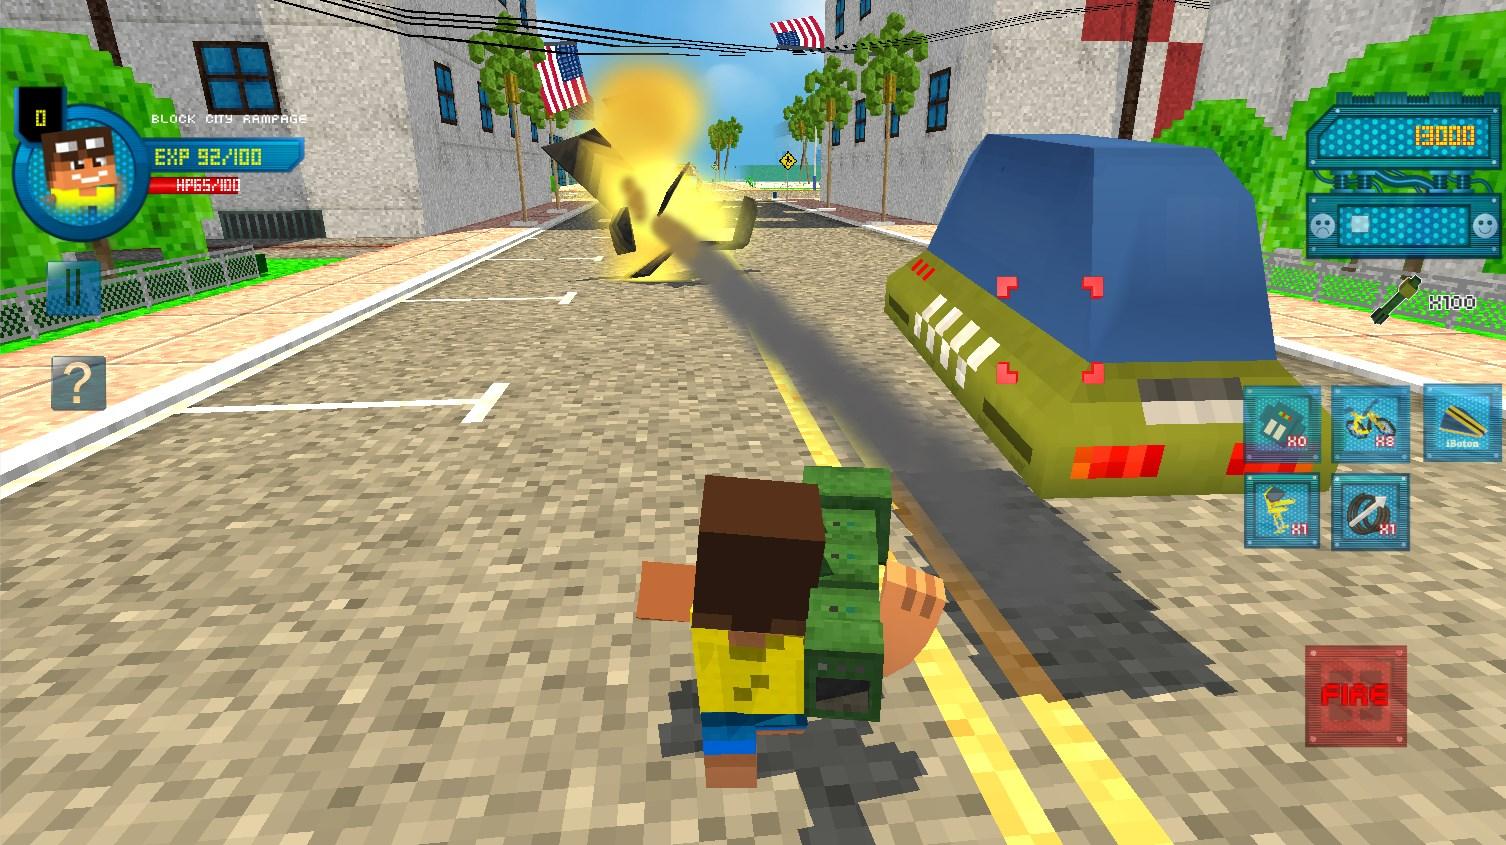 Block City Rampage - Imagem 1 do software